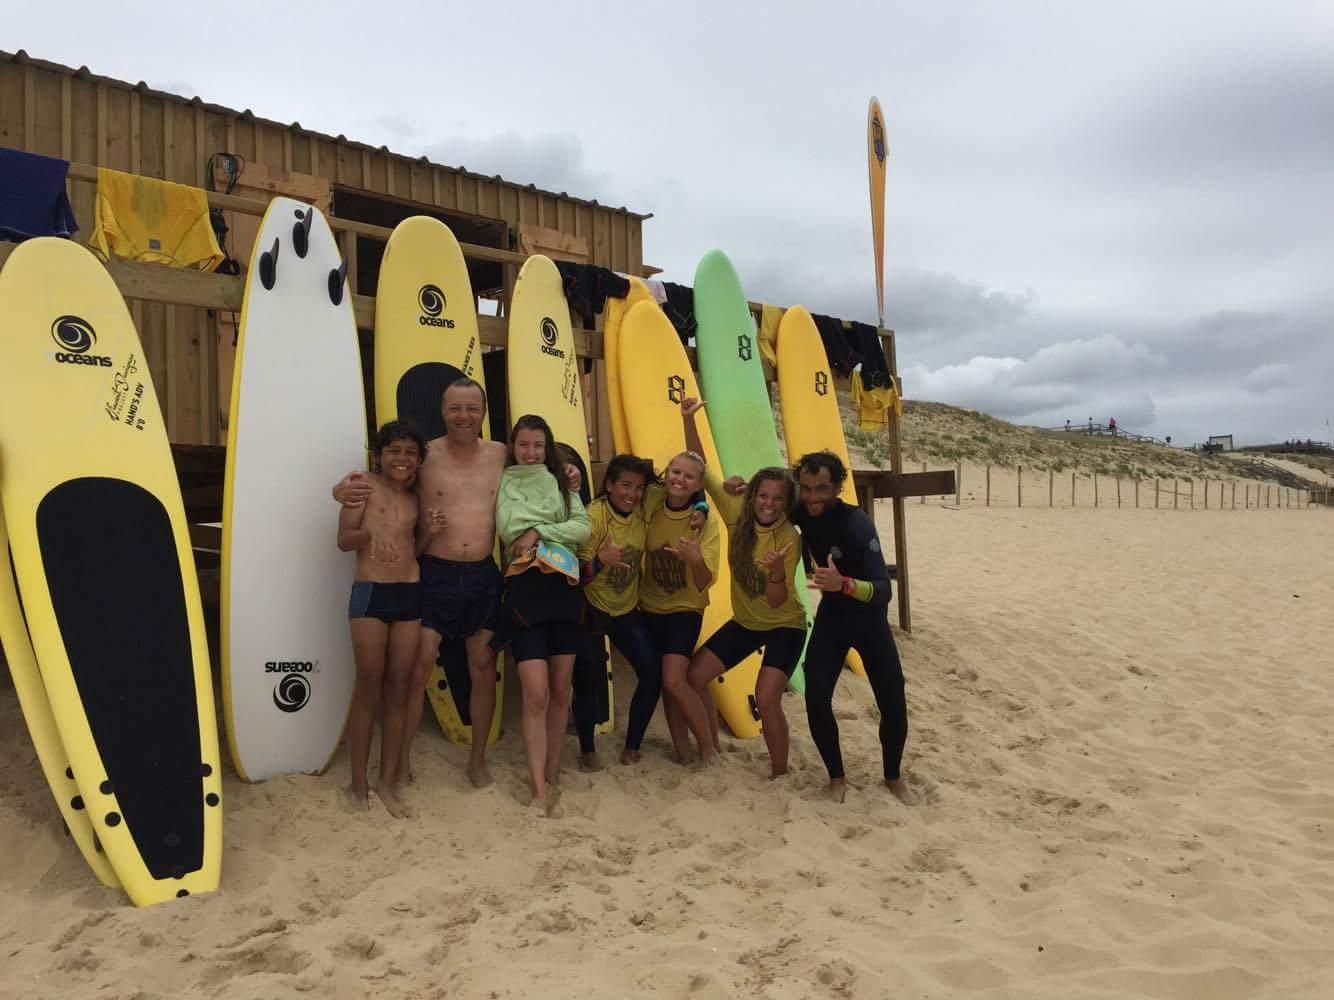 Activité enfants et ados : Initiation au surf/Bodyboard Watusurf School